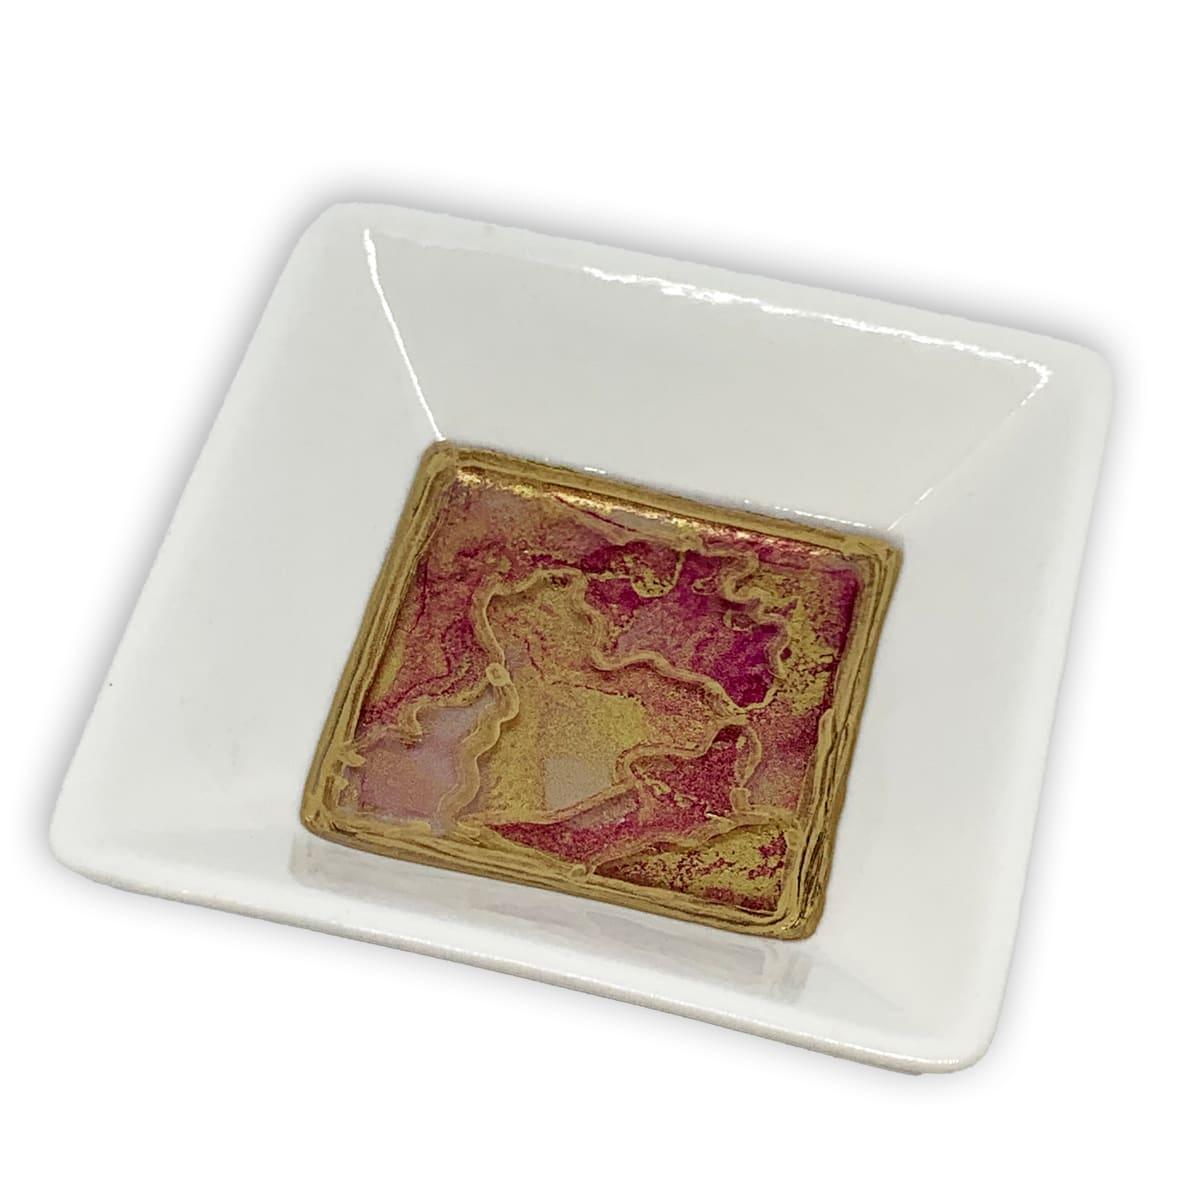 Ceramic White Trinket Dish - Pink Gold #3 by Susi Schuele